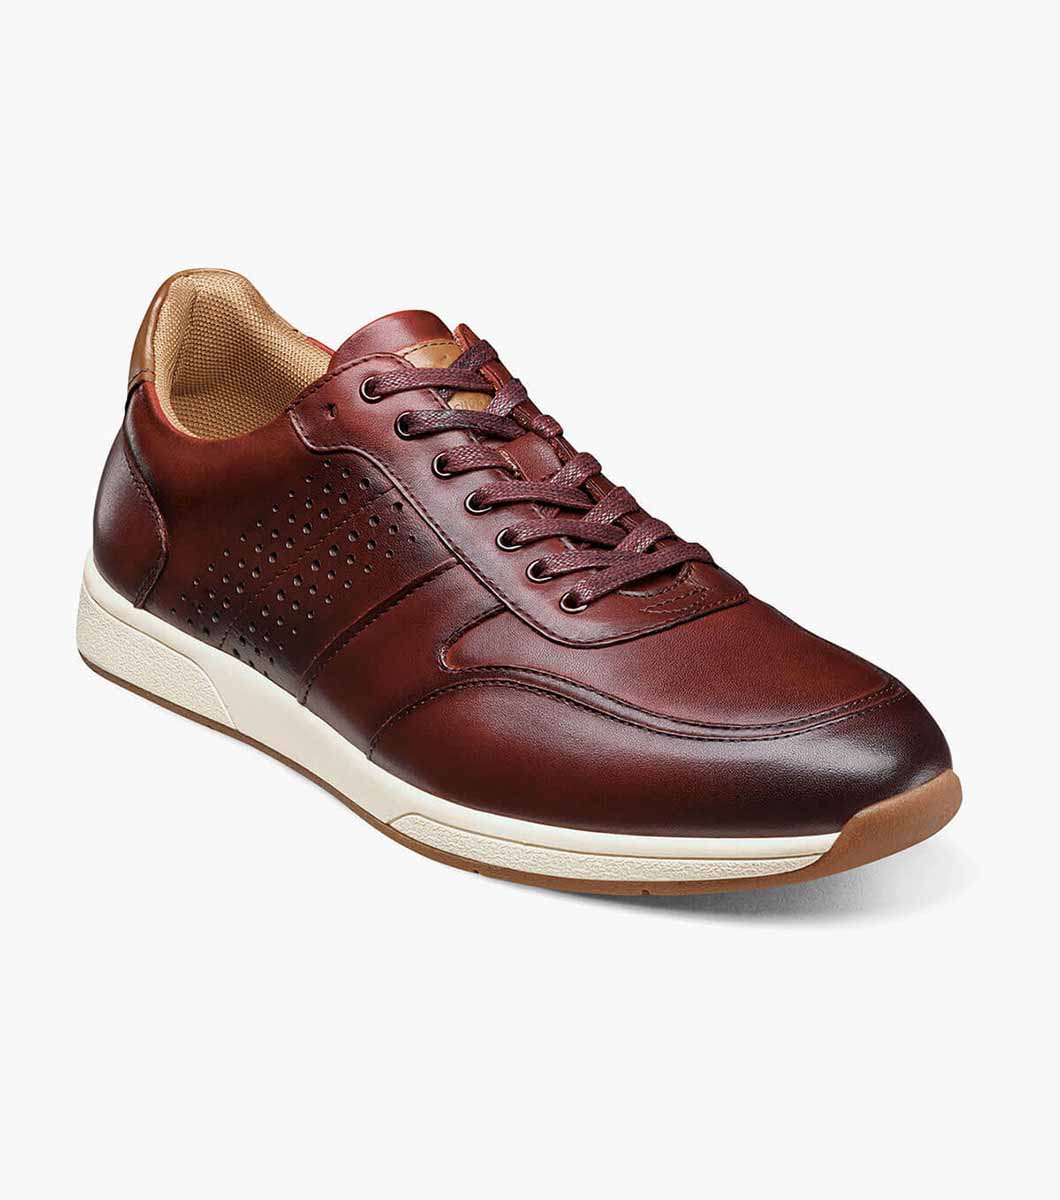 Fusion by Florsheim Shoes